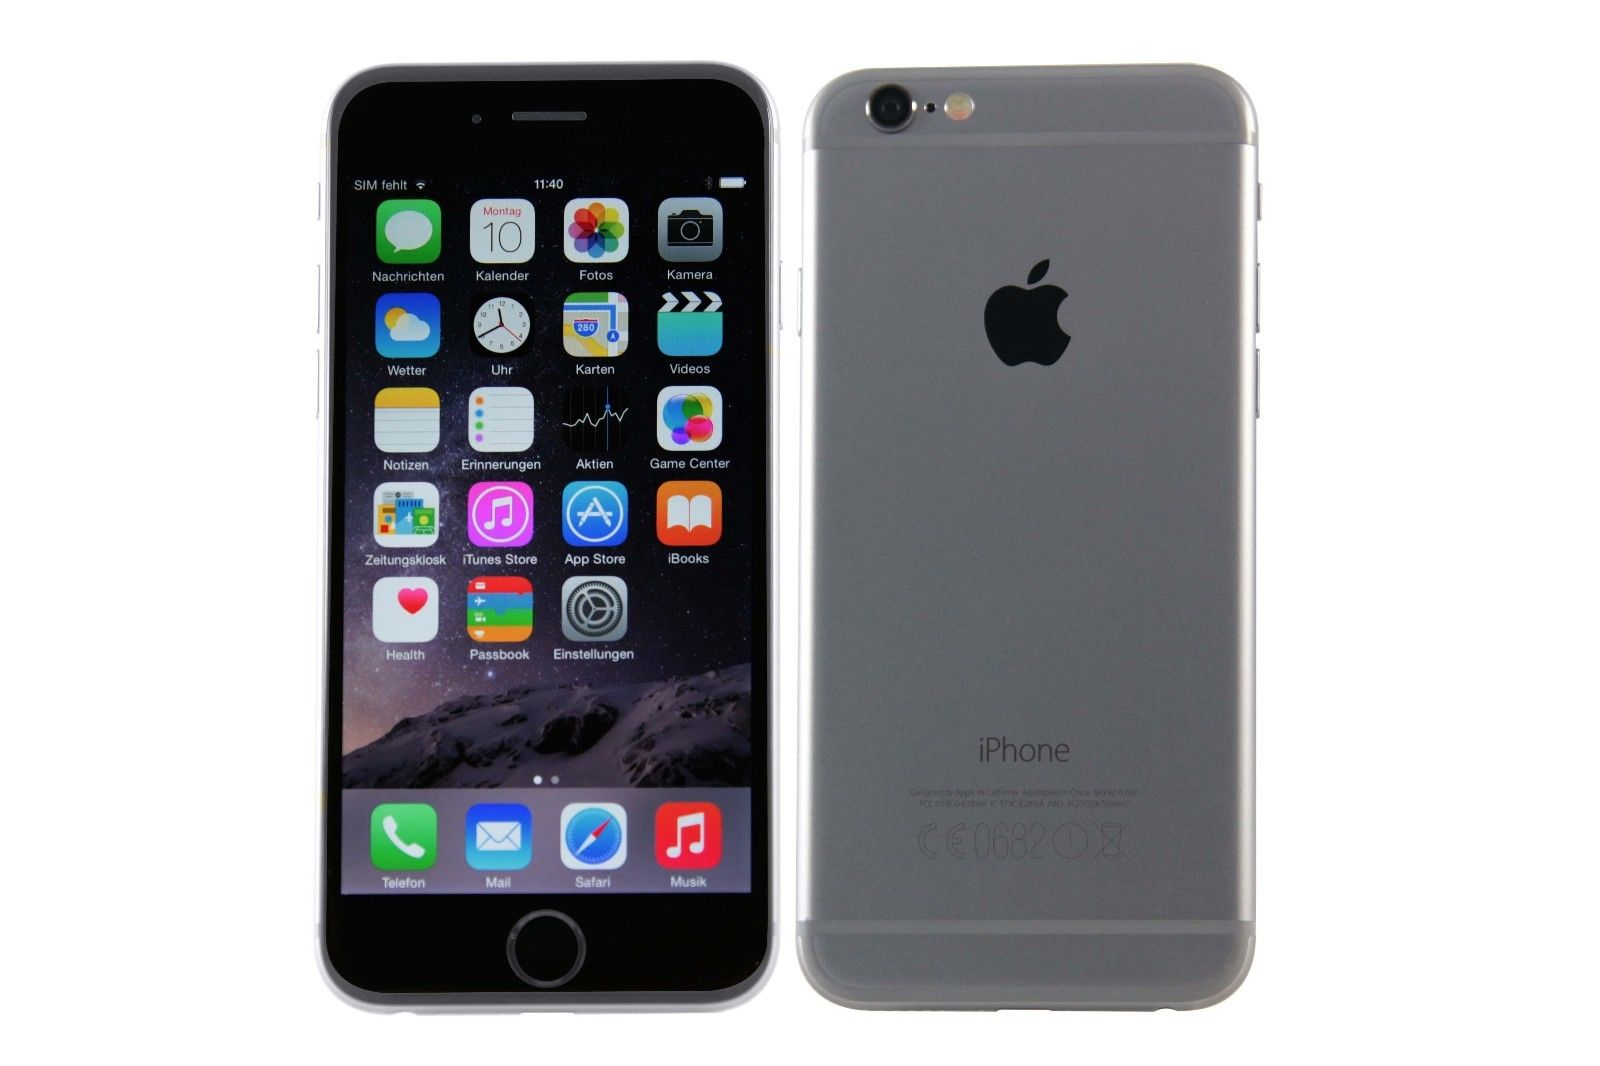 Apple iPhone 6 16GB Spacegrau (Ohne Simlock) - Gebraucht / AKTION